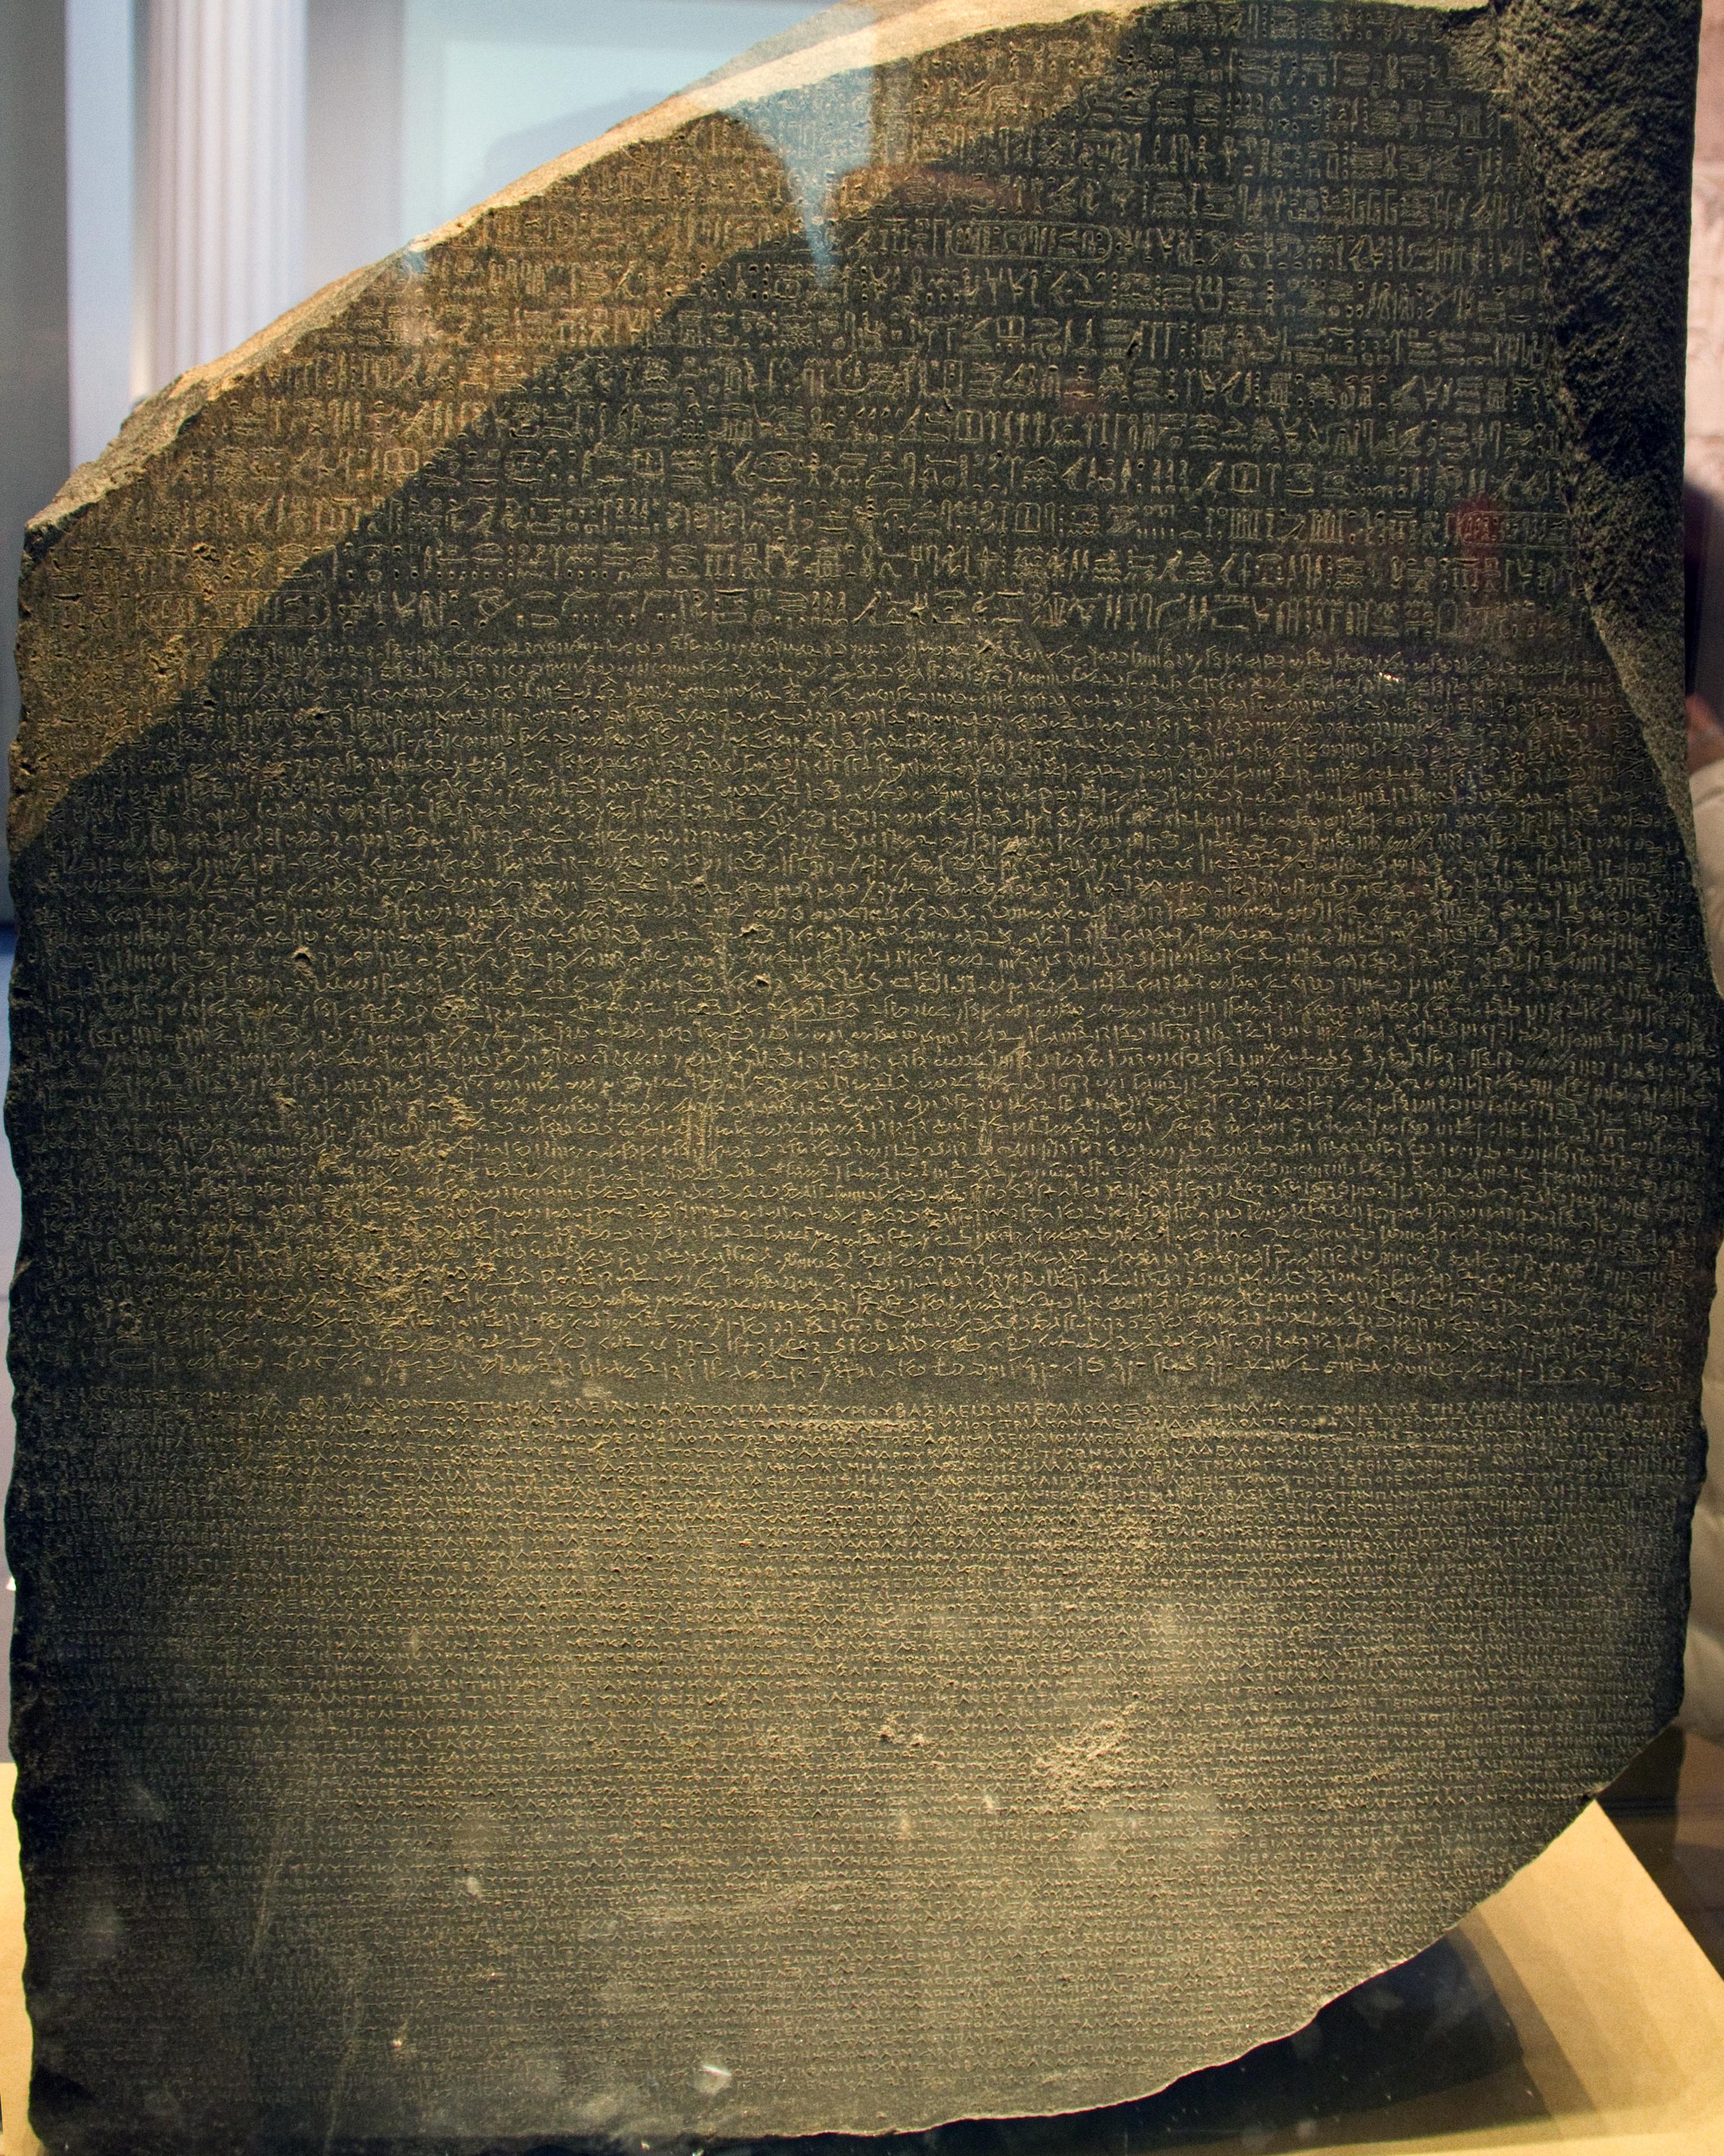 Rosetta Stone Download Rosetta Stone Inloggen